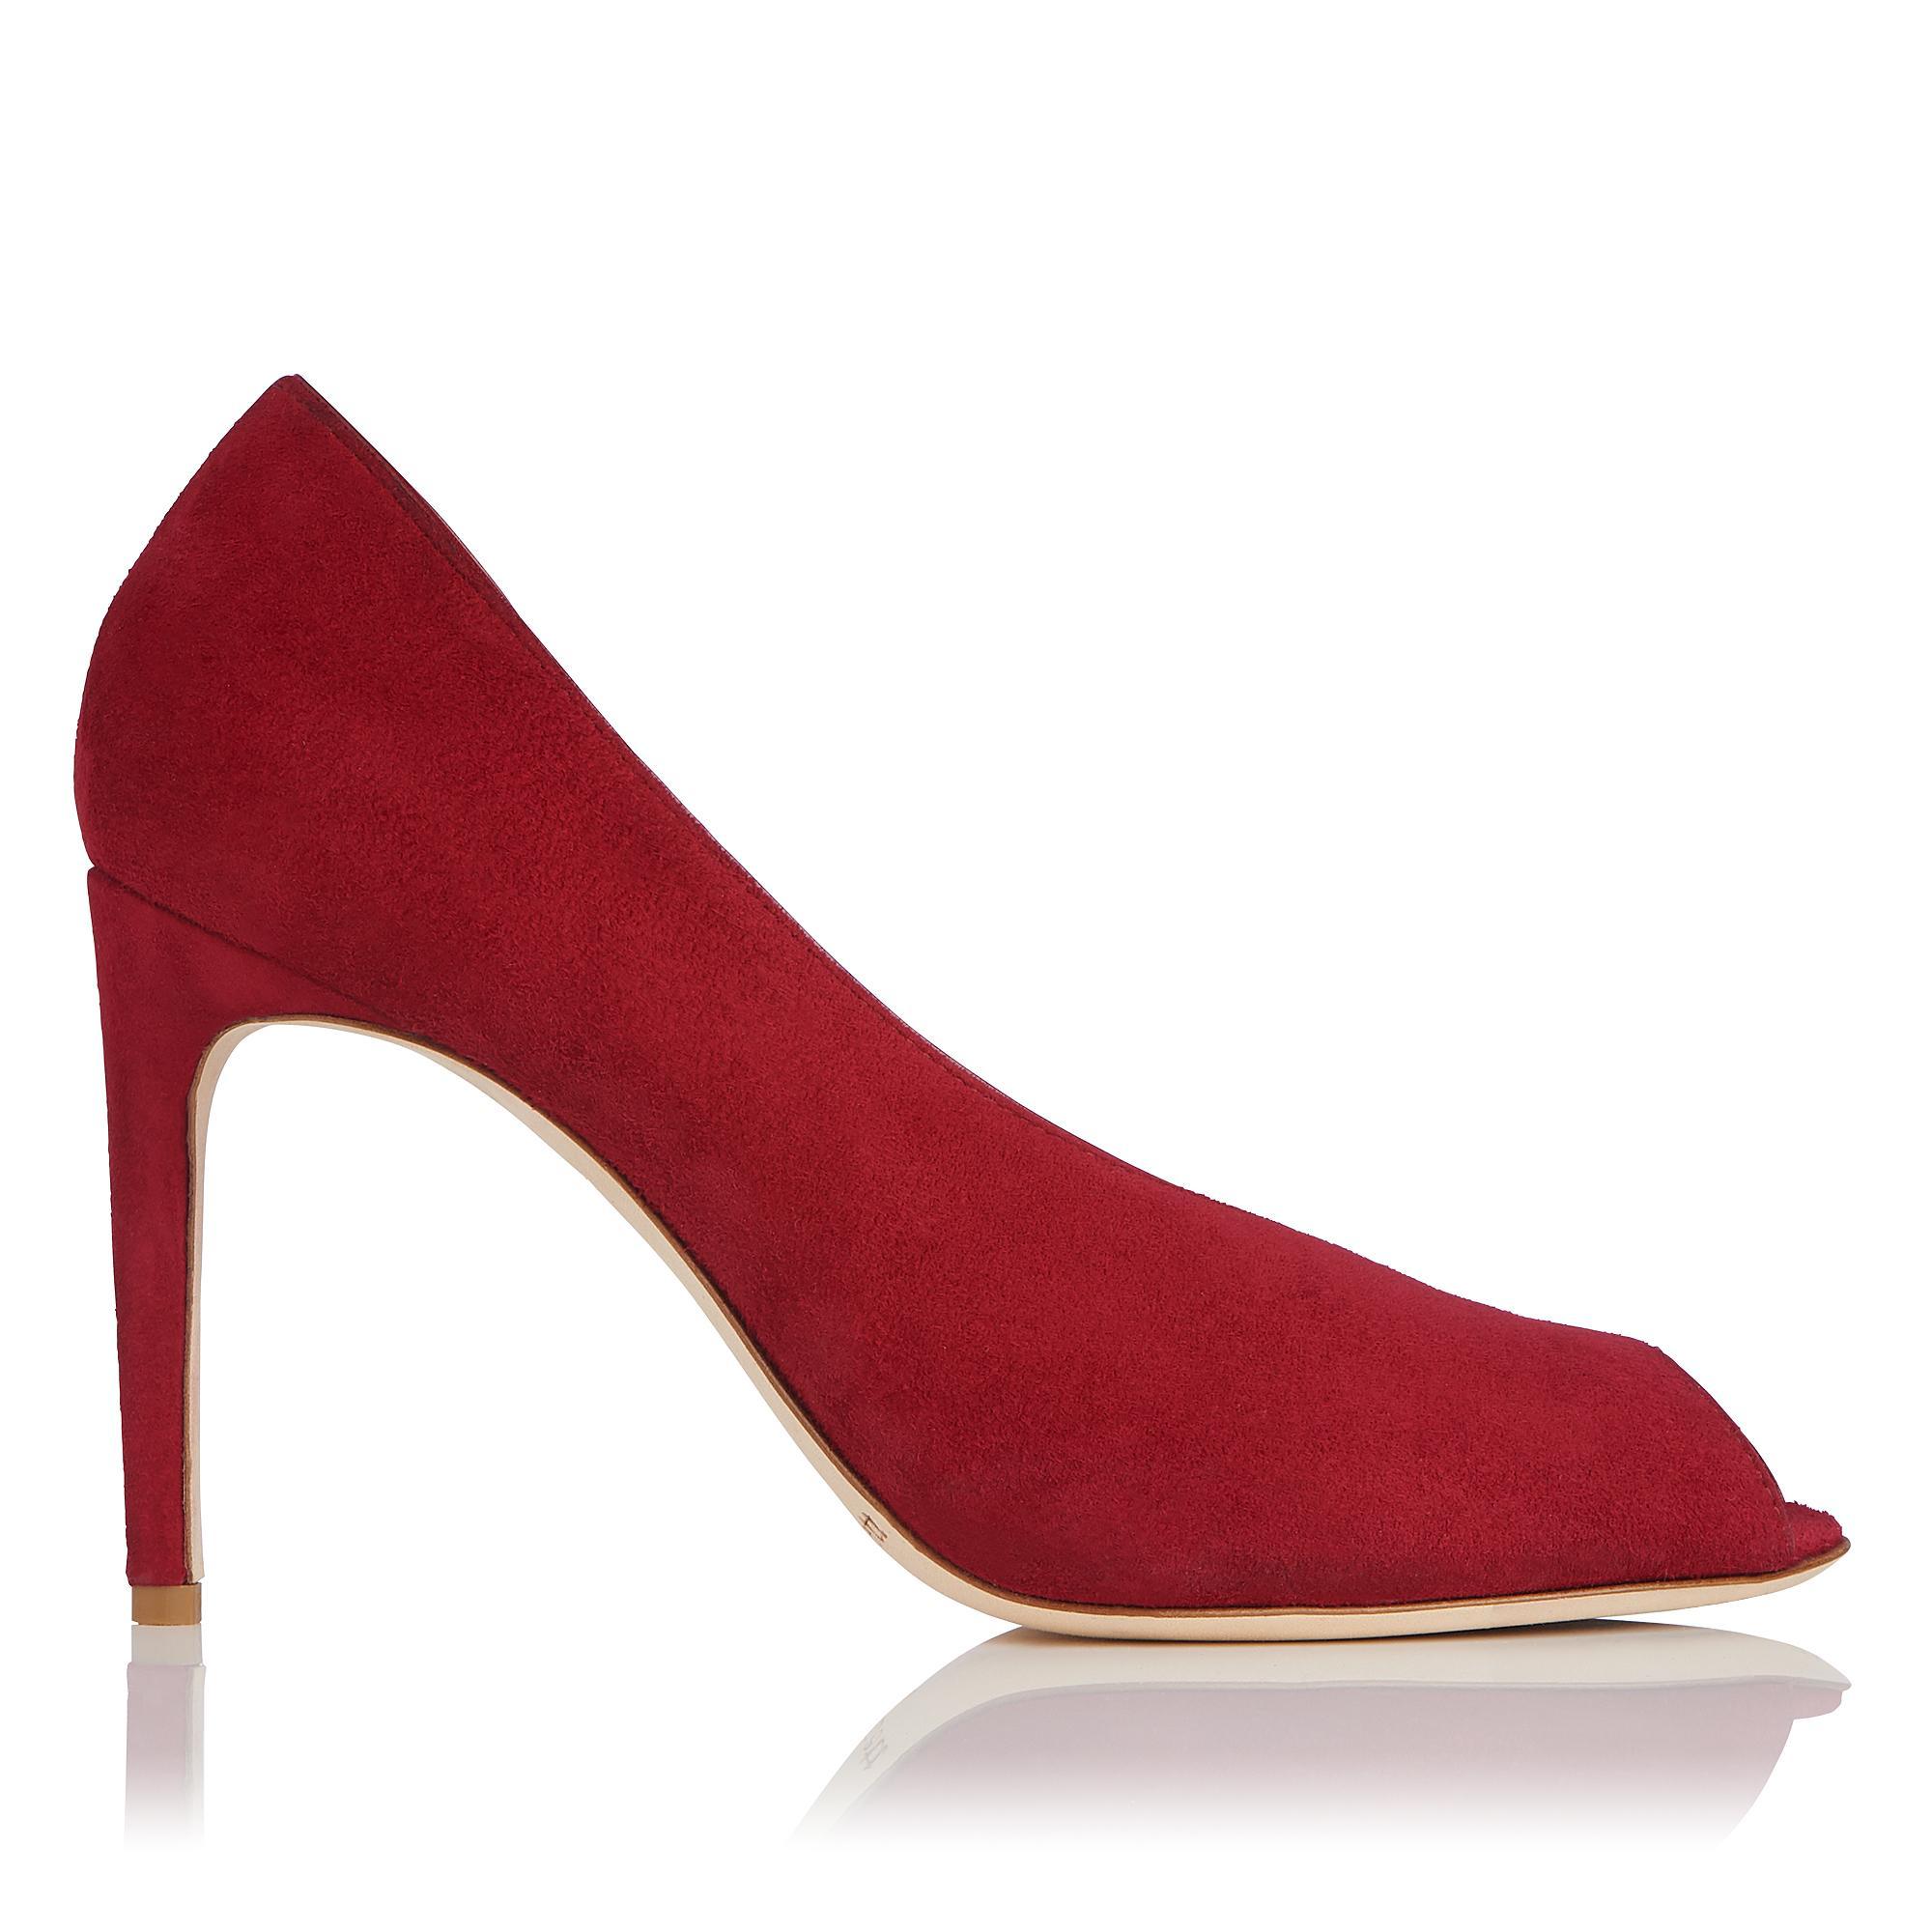 Kayleigh Red Suede Heel